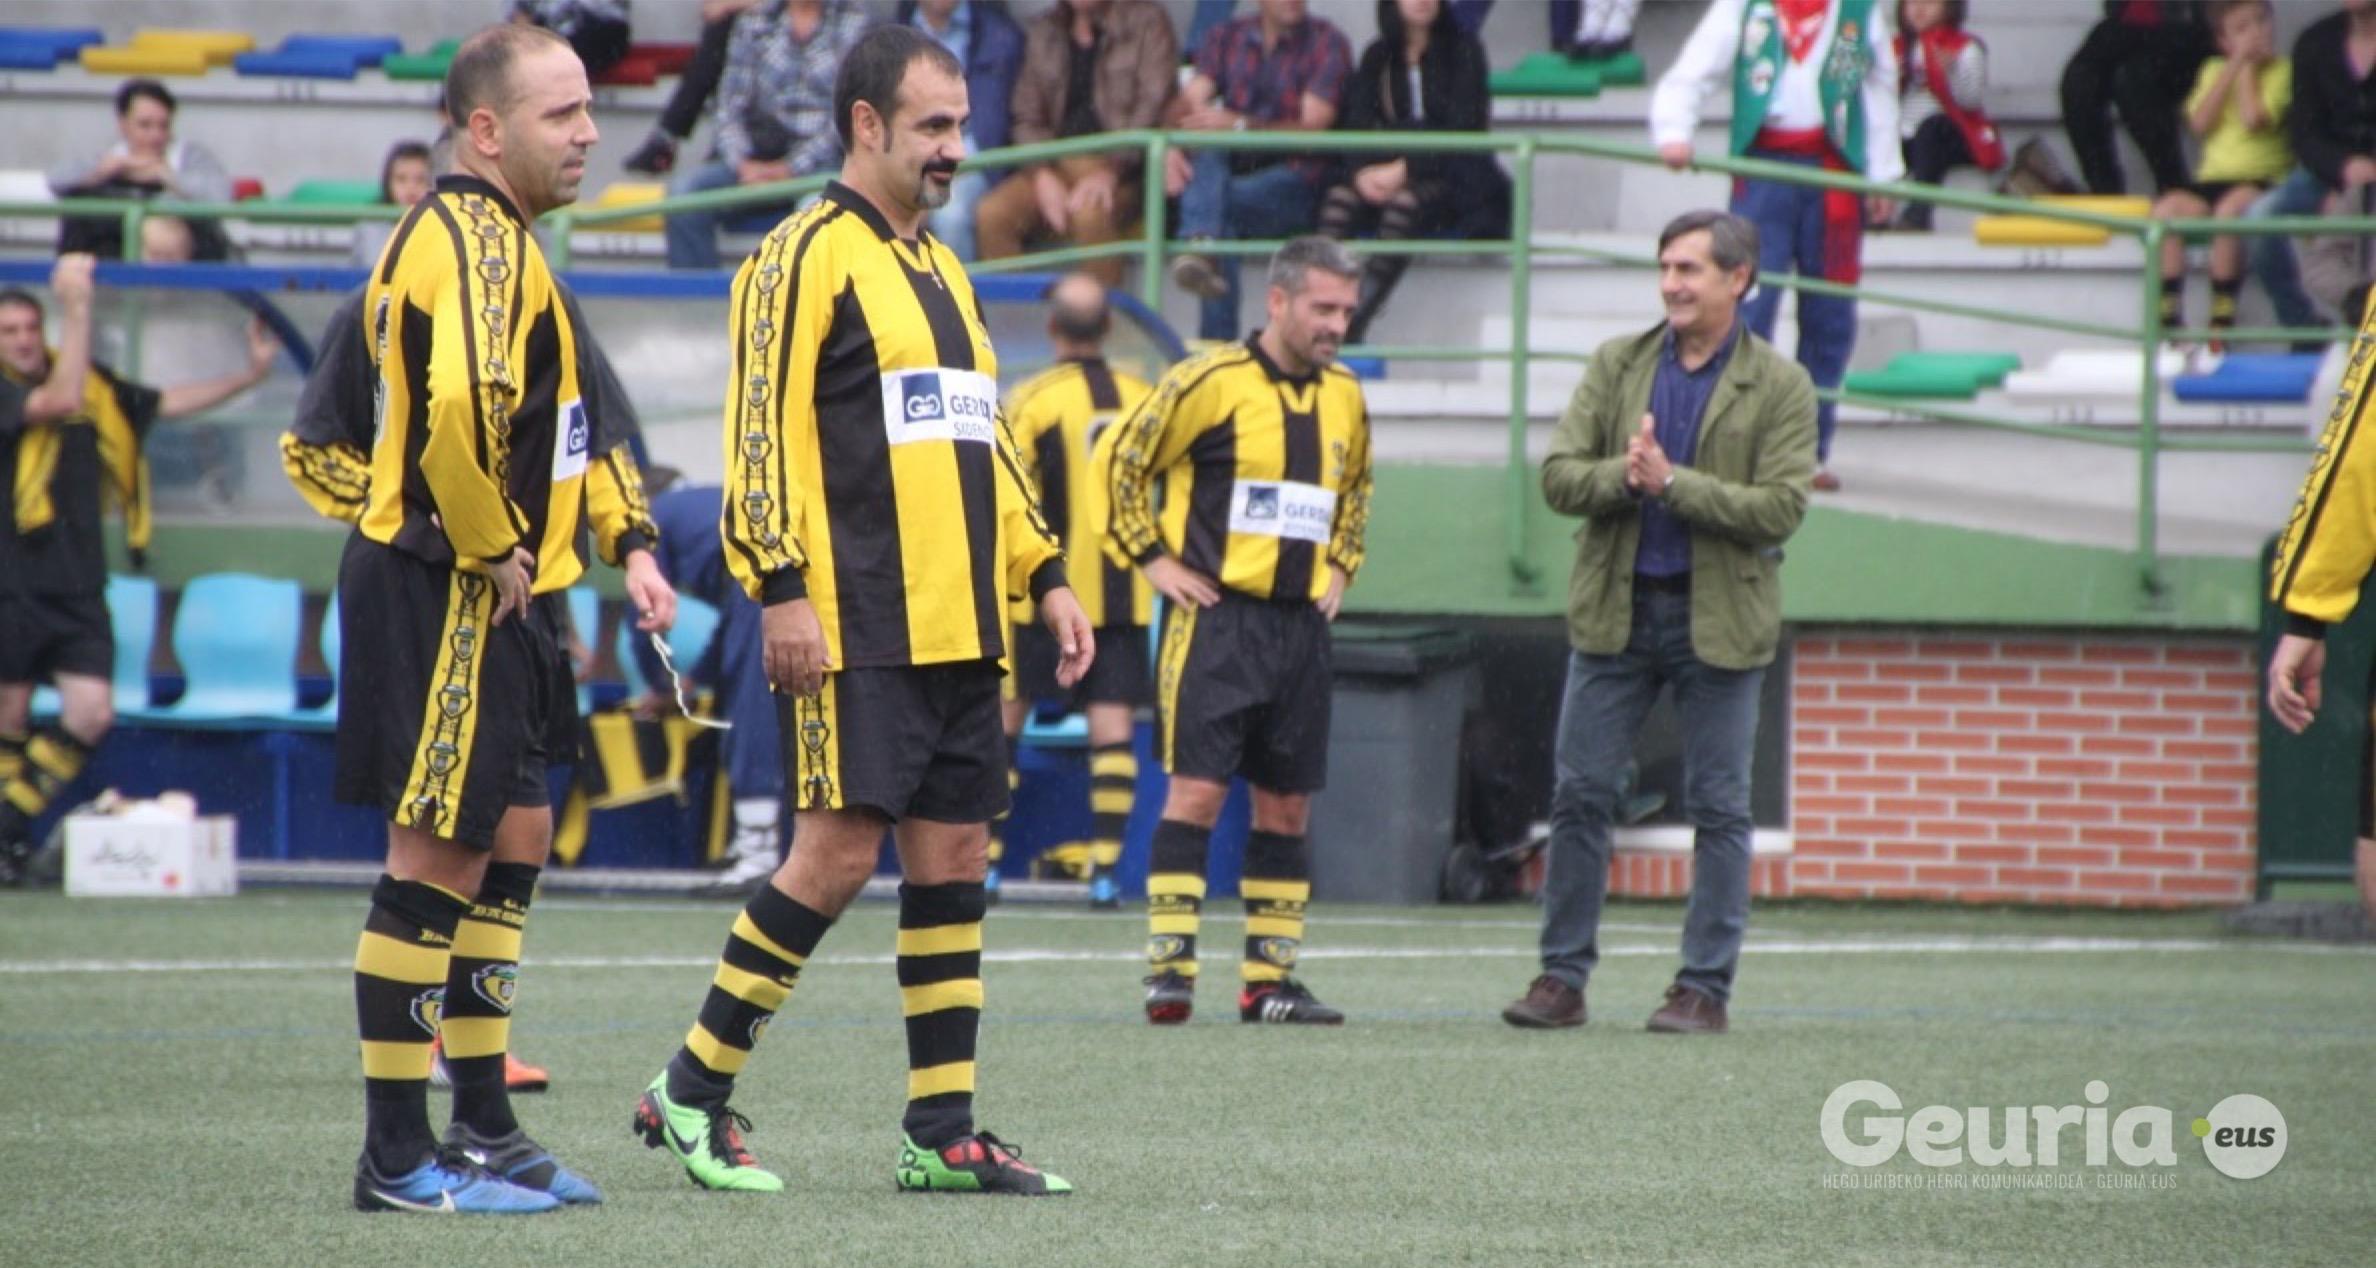 basauri_san_fausto_2015_futbol_basconia_beteranoak_9